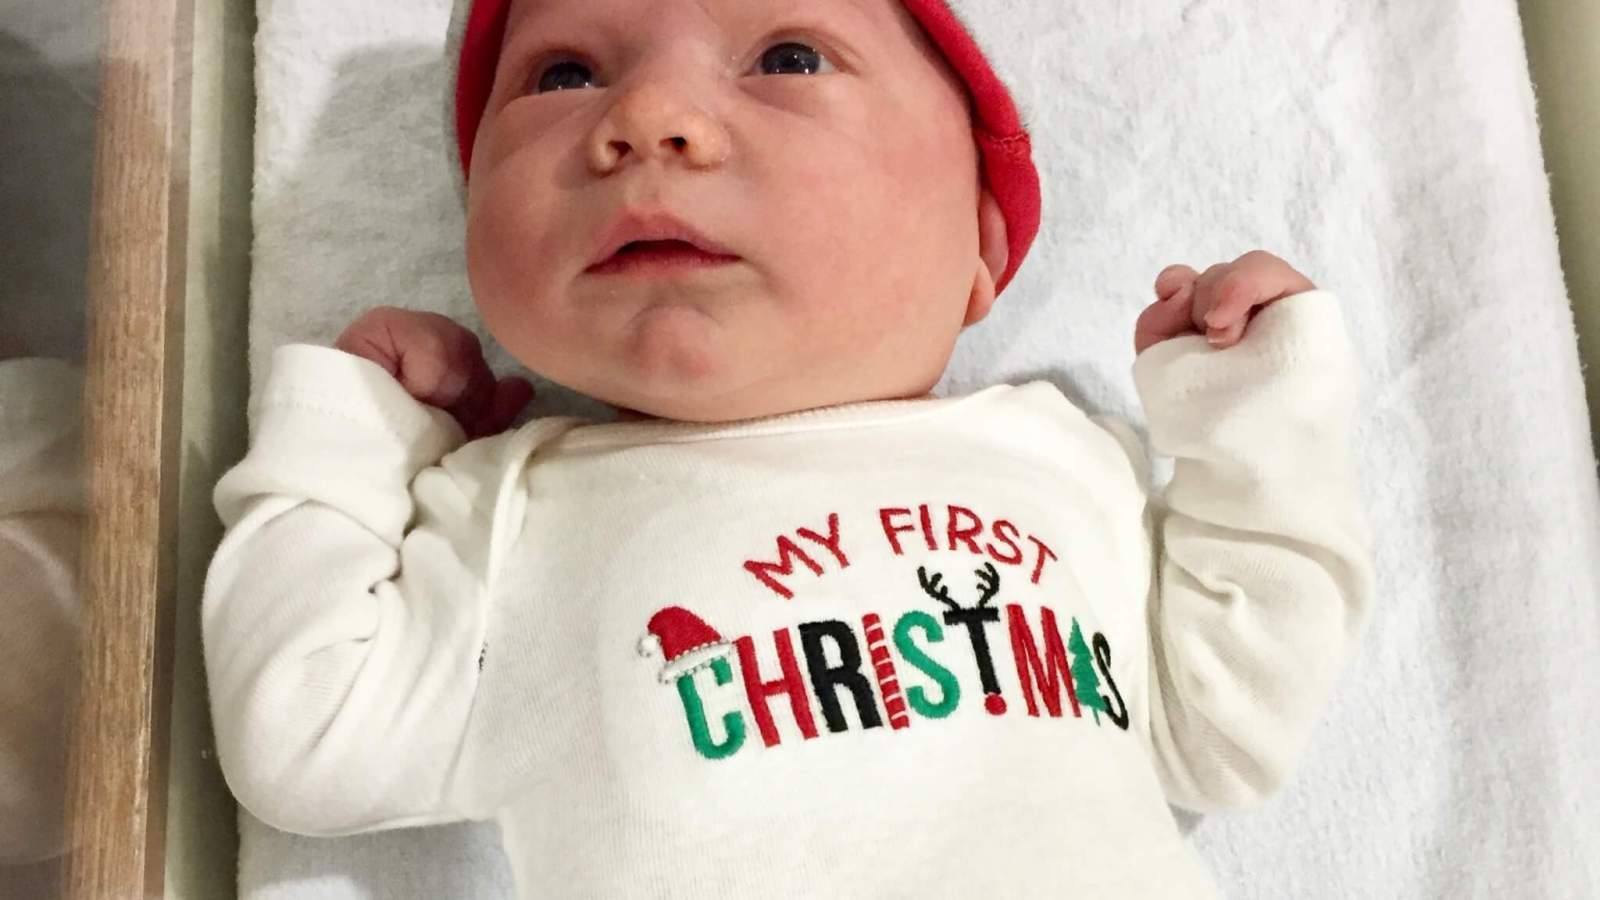 Baby E in hospital bassinet